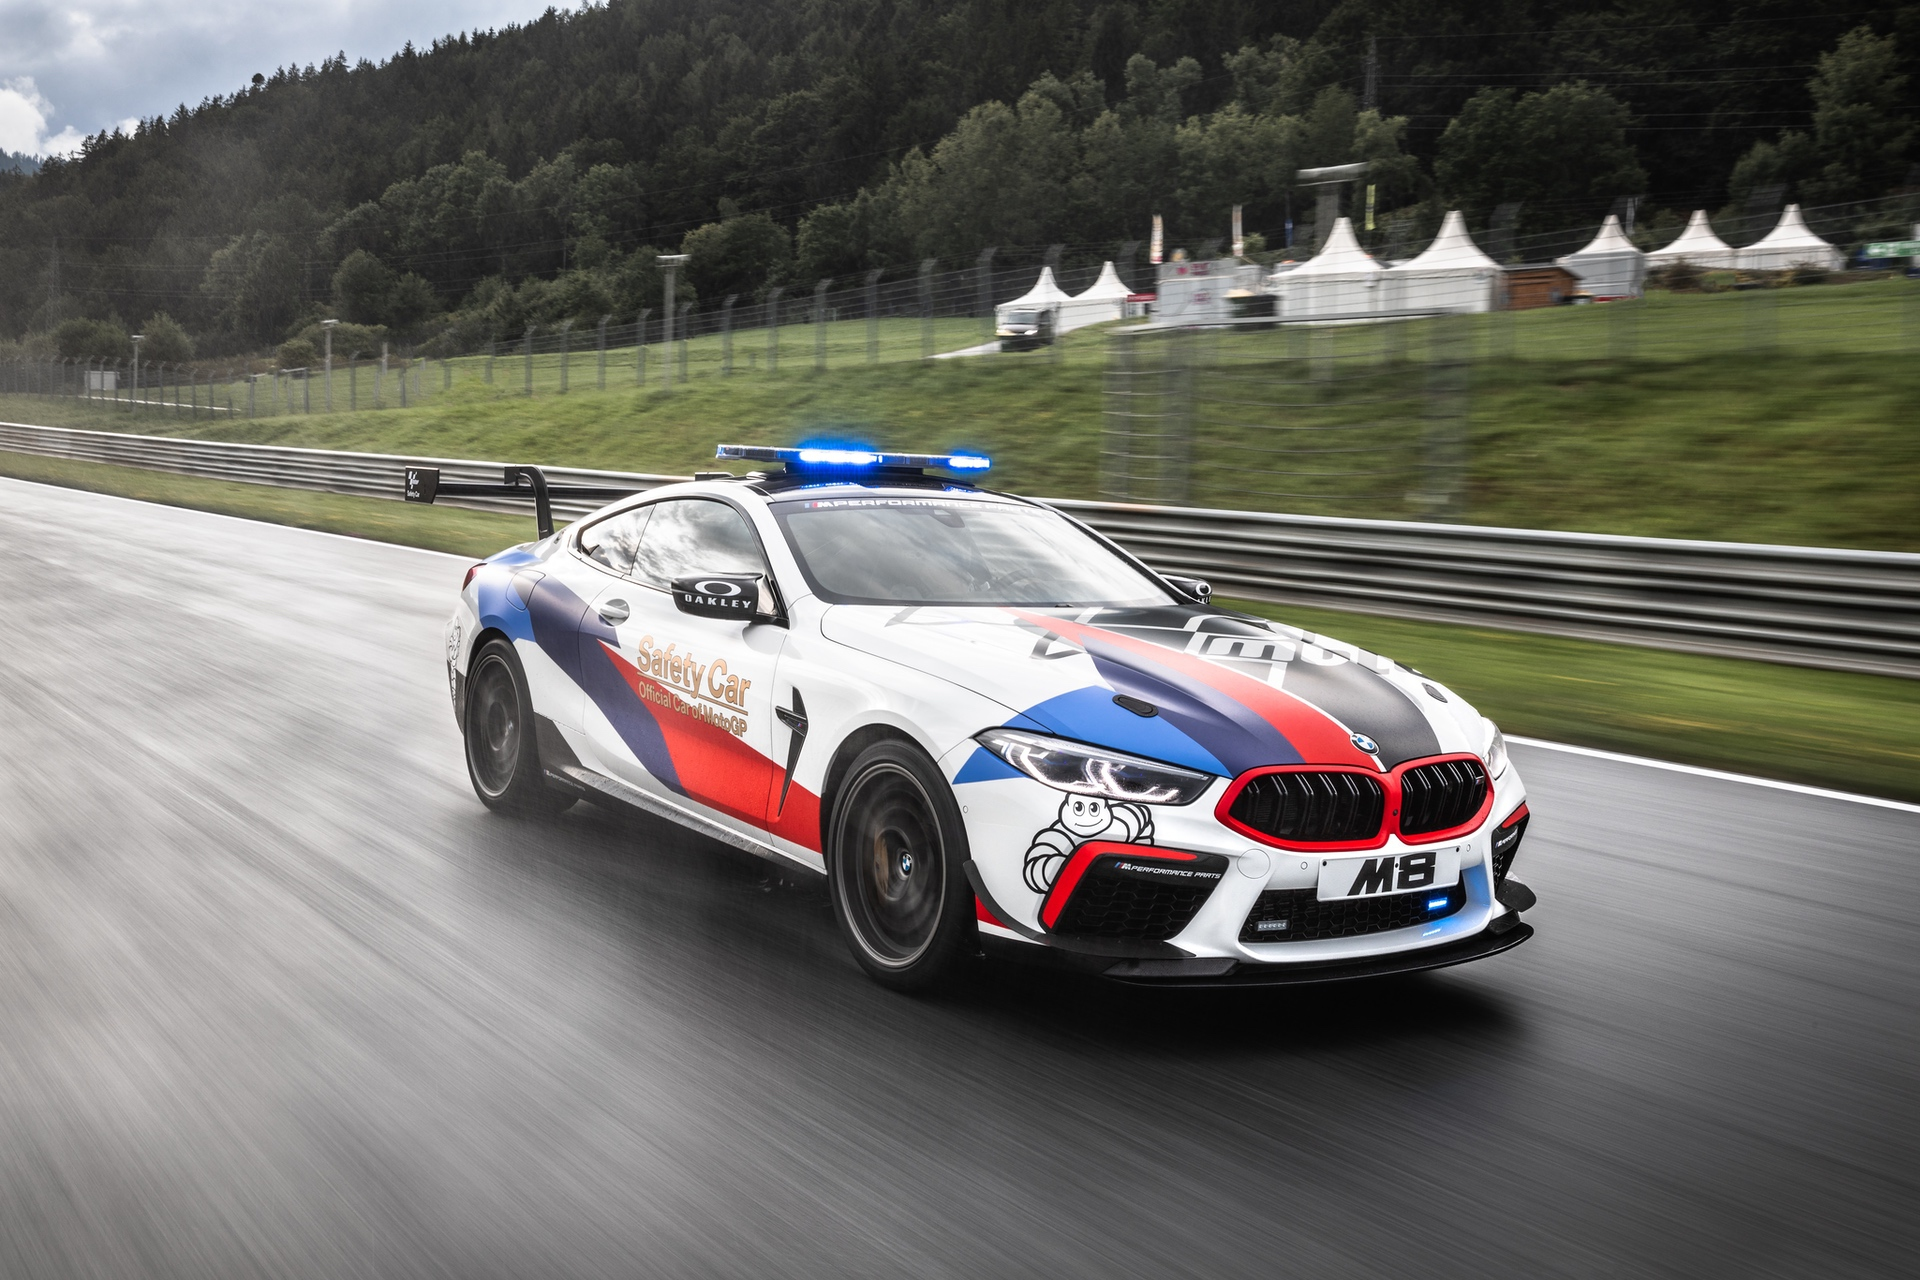 BMW_M8_MotoGP_Safety_Car_0053